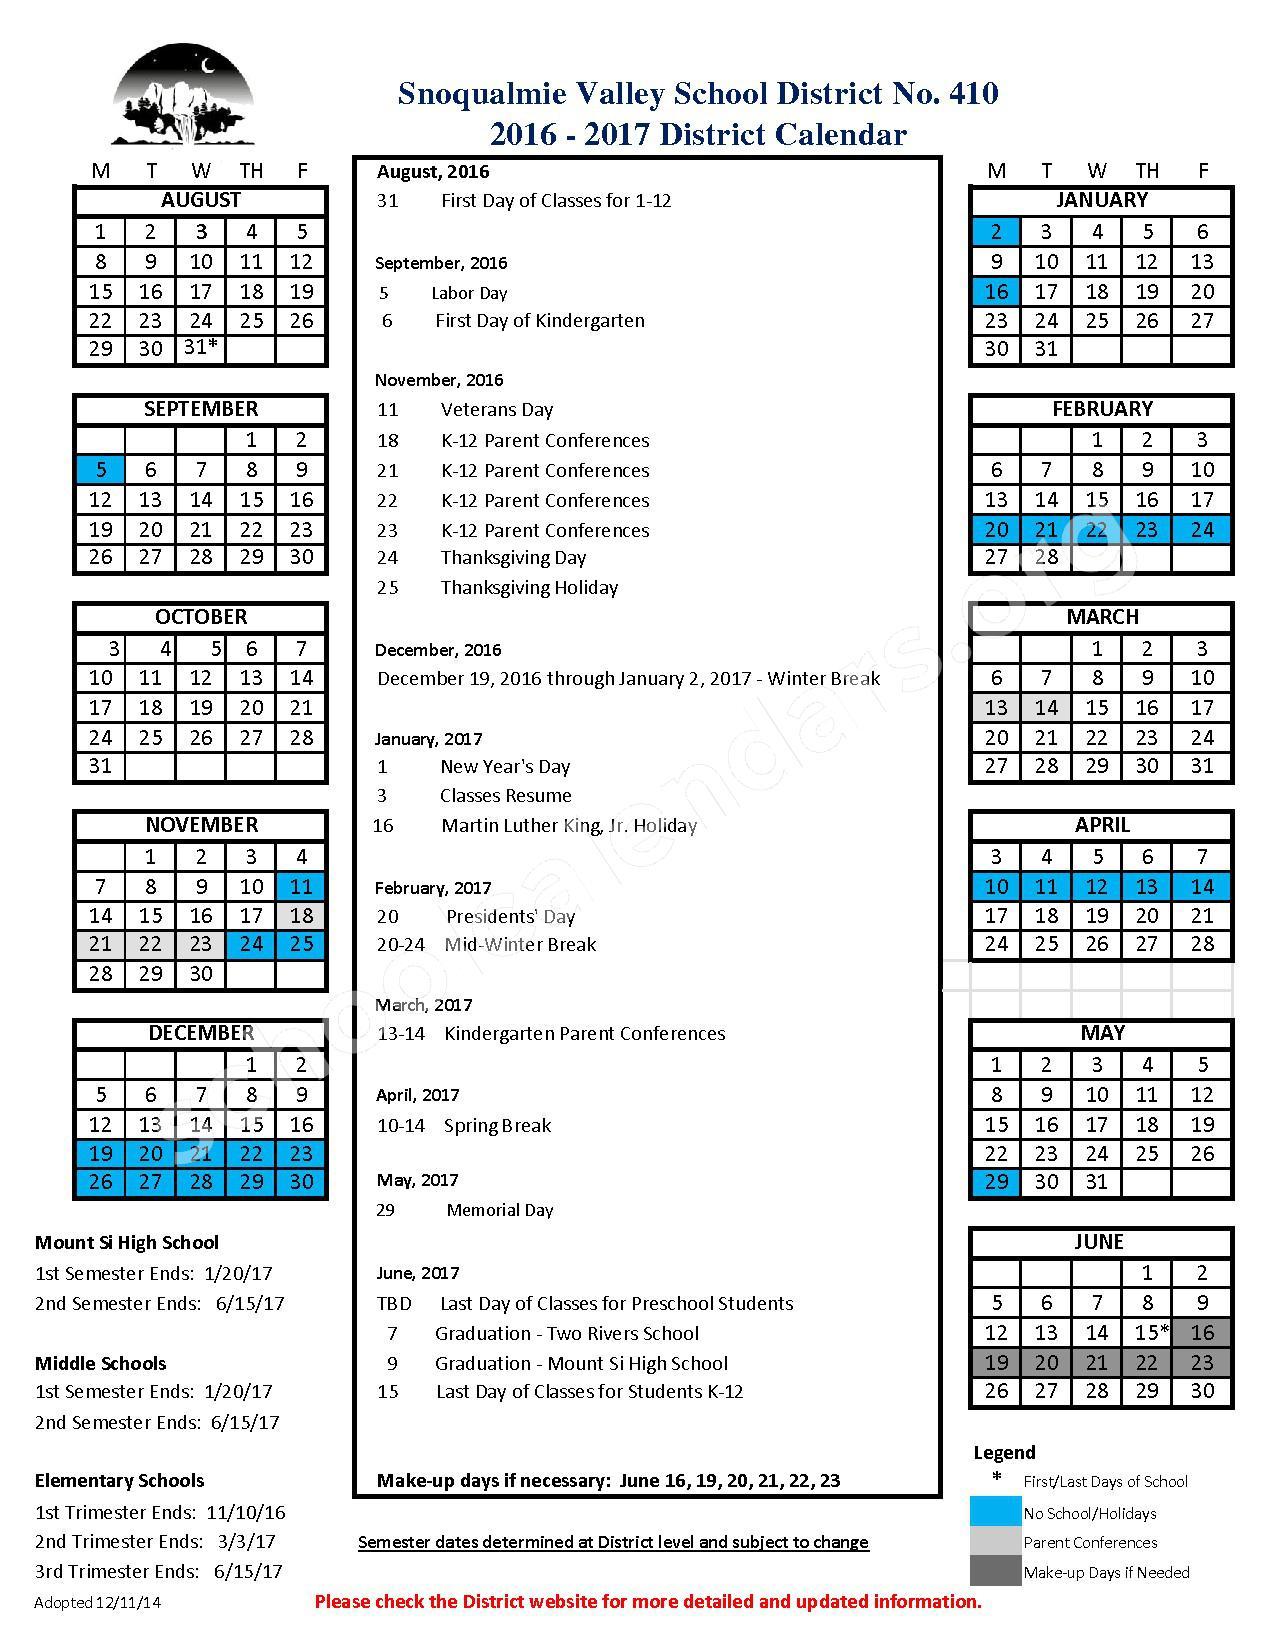 2016-2017 District Calendar – Snoqualmie Valley School District – page 1